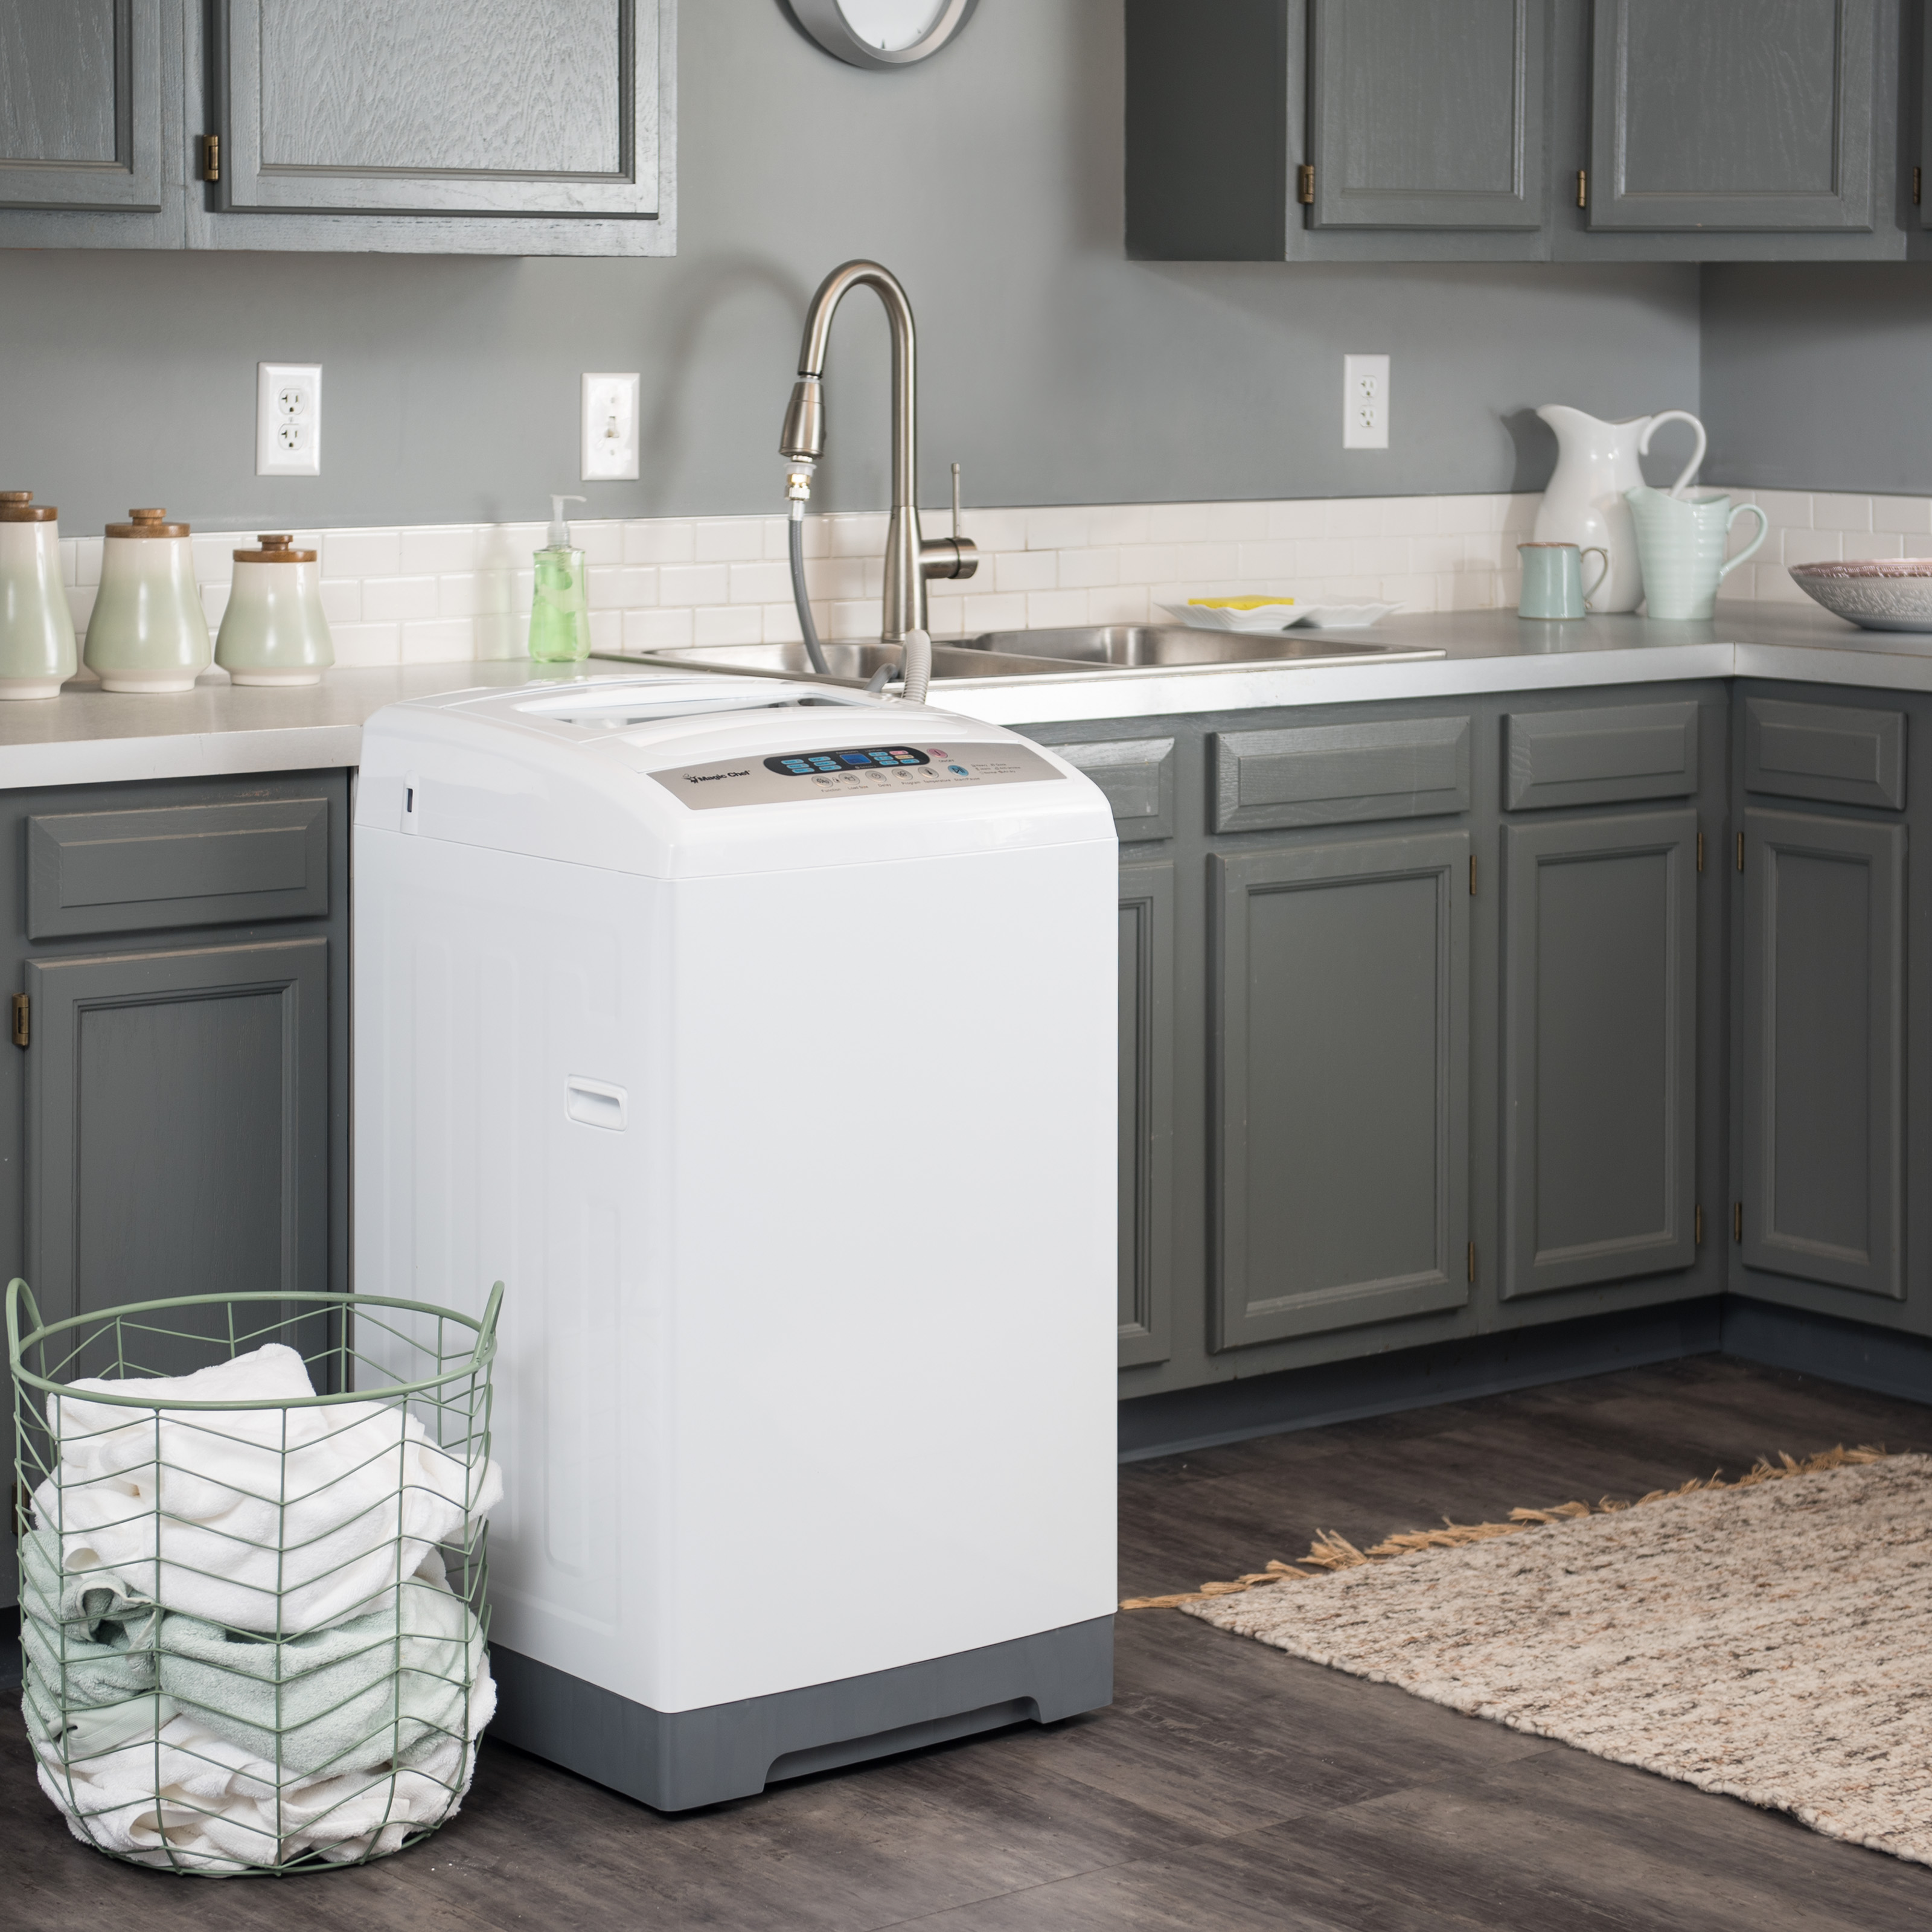 Magic Chef 1.6 cu ft Topload Compact Washer, White - Walmart.com